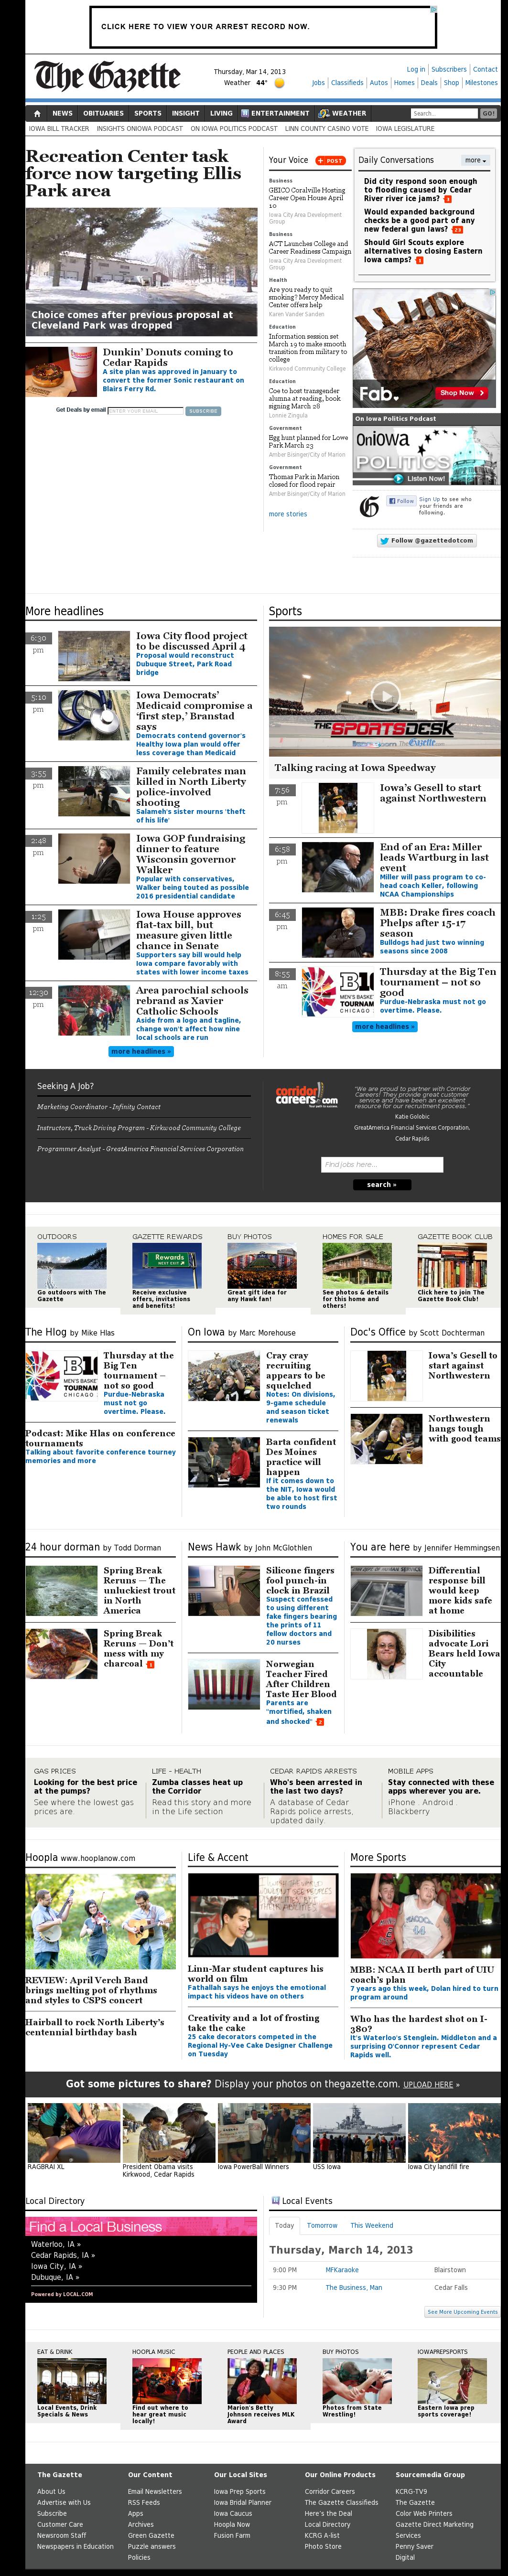 The (Cedar Rapids) Gazette at Friday March 15, 2013, 1:08 a.m. UTC